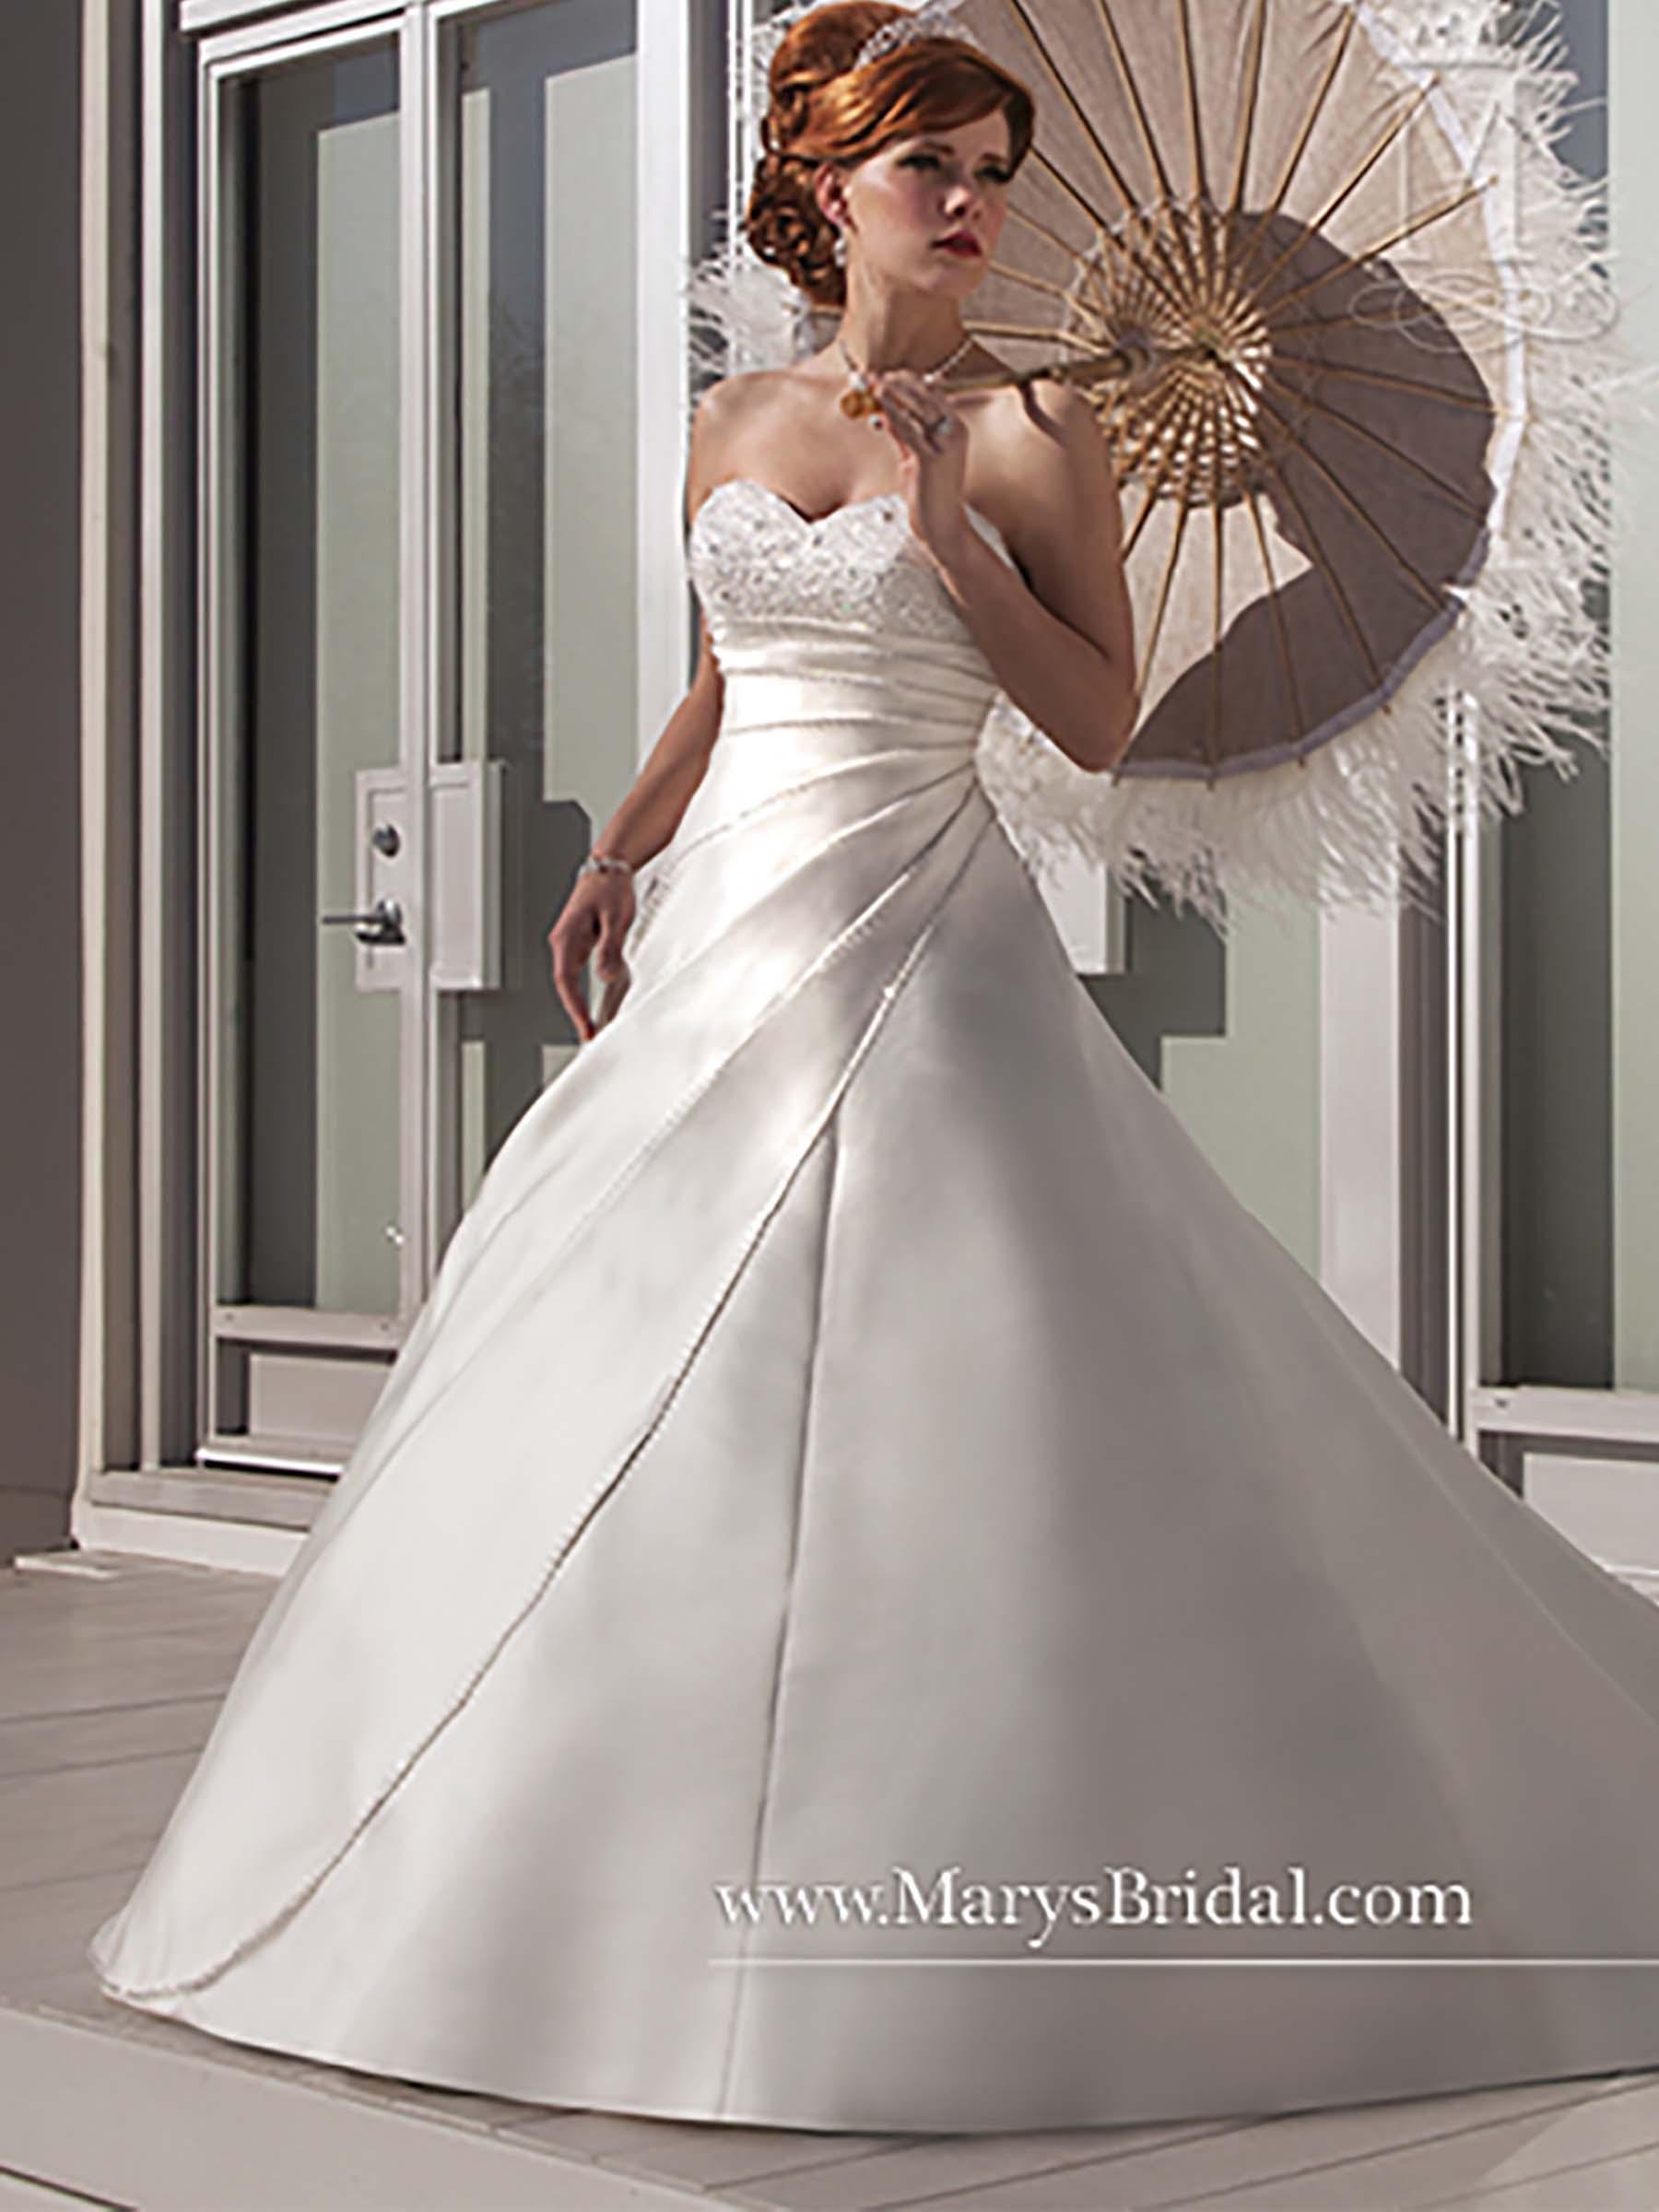 Bridal Gowns – Fairy Tale Princess